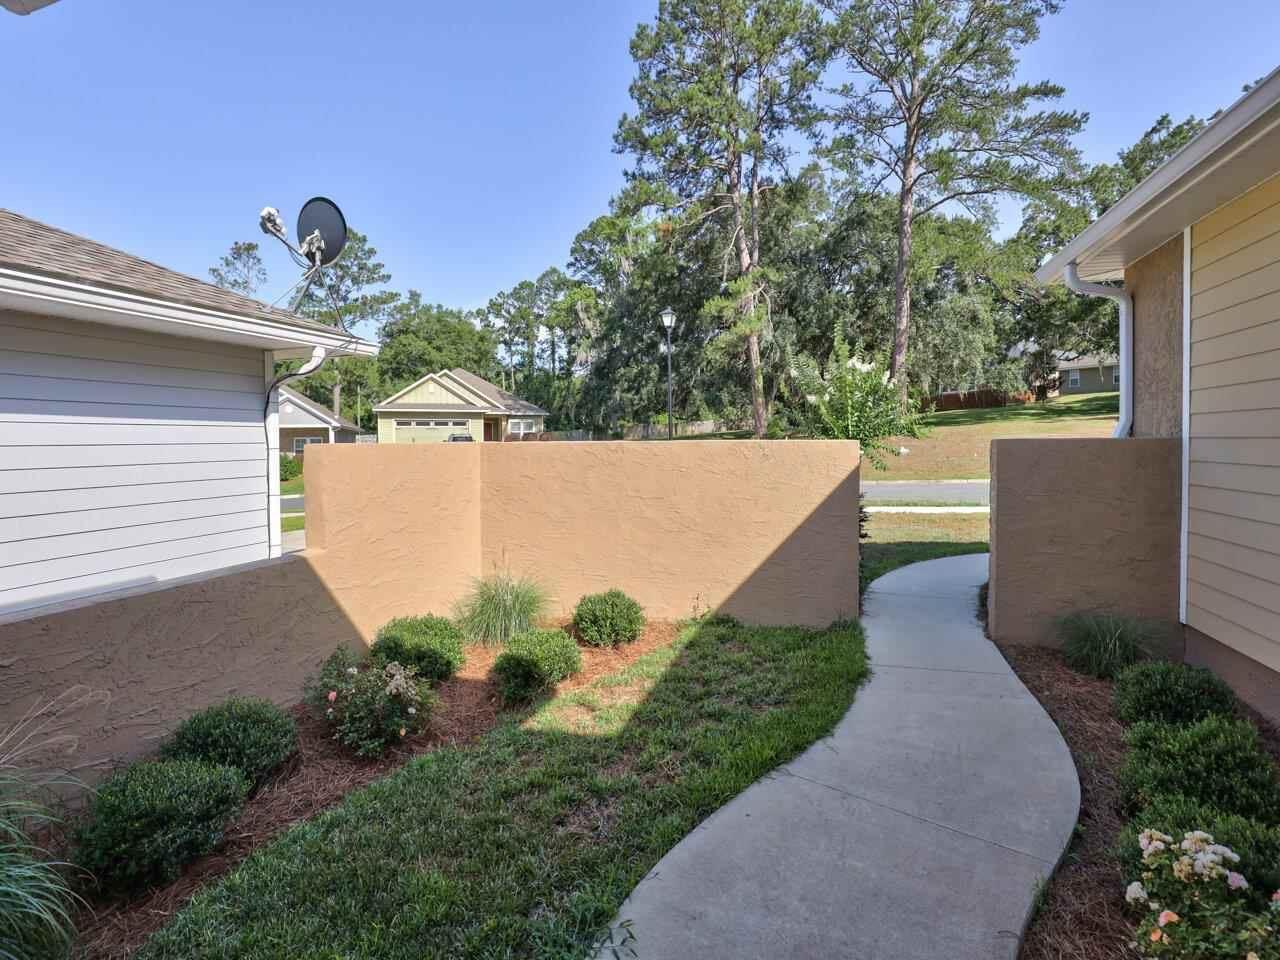 Photo of 2423 Tippecanoe Ridge, TALLAHASSEE, FL 32303 (MLS # 333216)